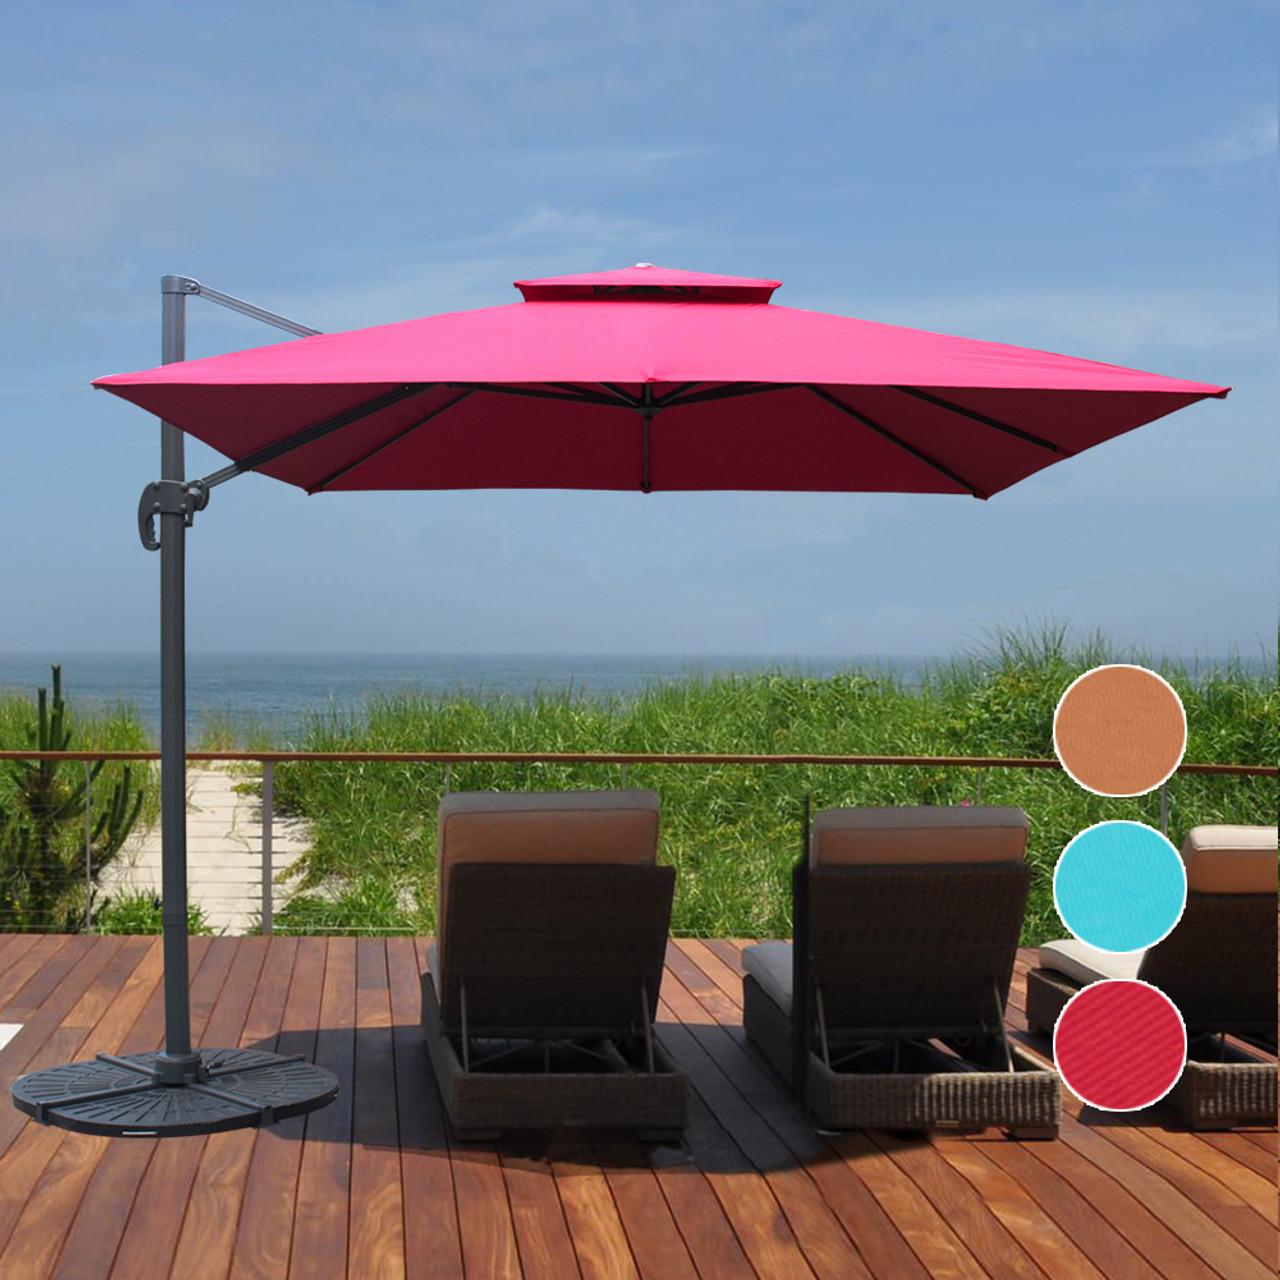 Sundale Outdoor 10ft Square Offset Hanging Umbrella Market Patio Umbrella  Aluminum Cantilever Pole W/Stylish